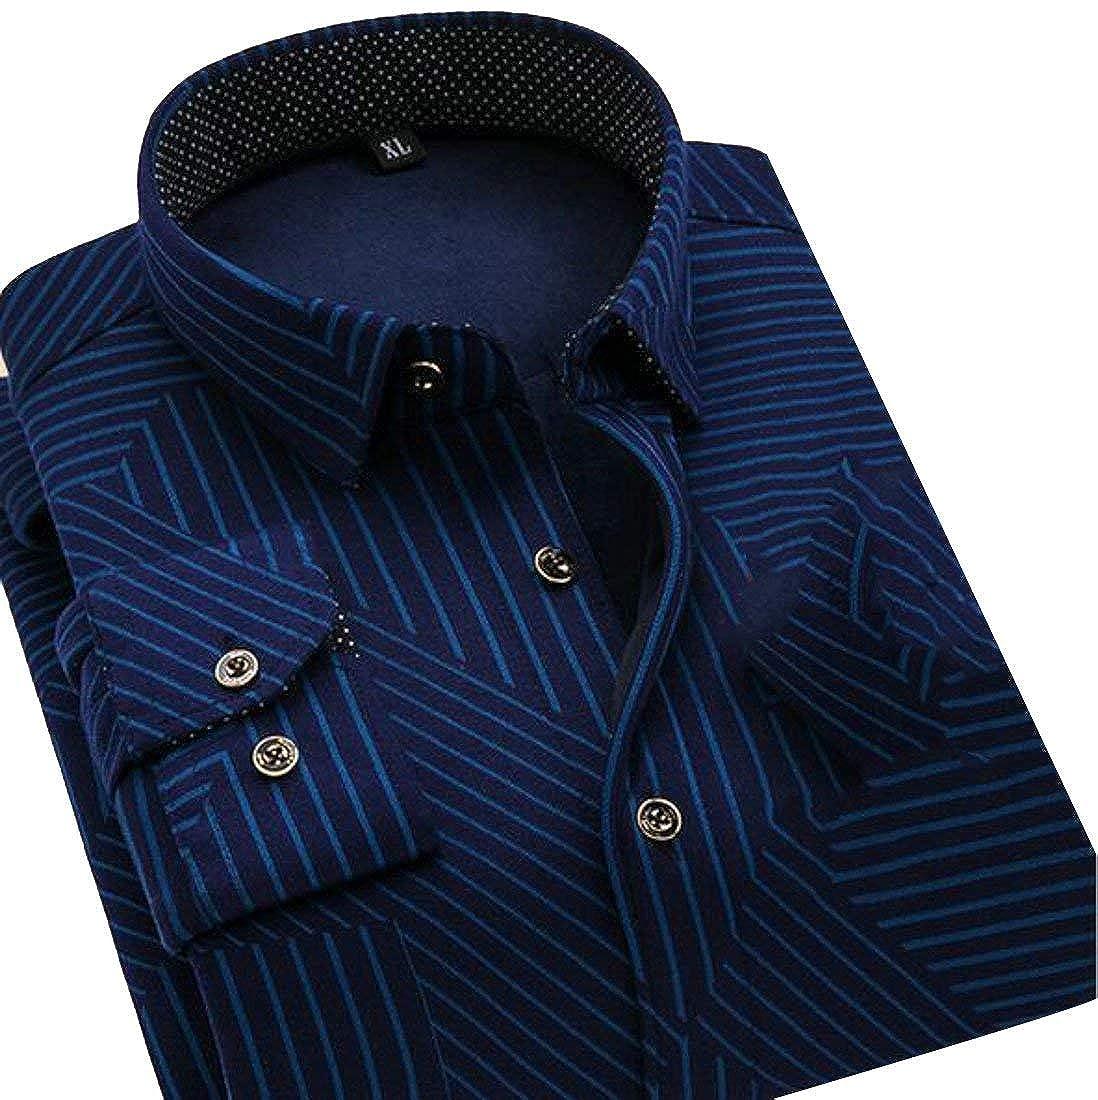 SELX Men Plus Size Plus Size Autumn Thicken Long Sleeve Button Front Fleece Lined Shirts